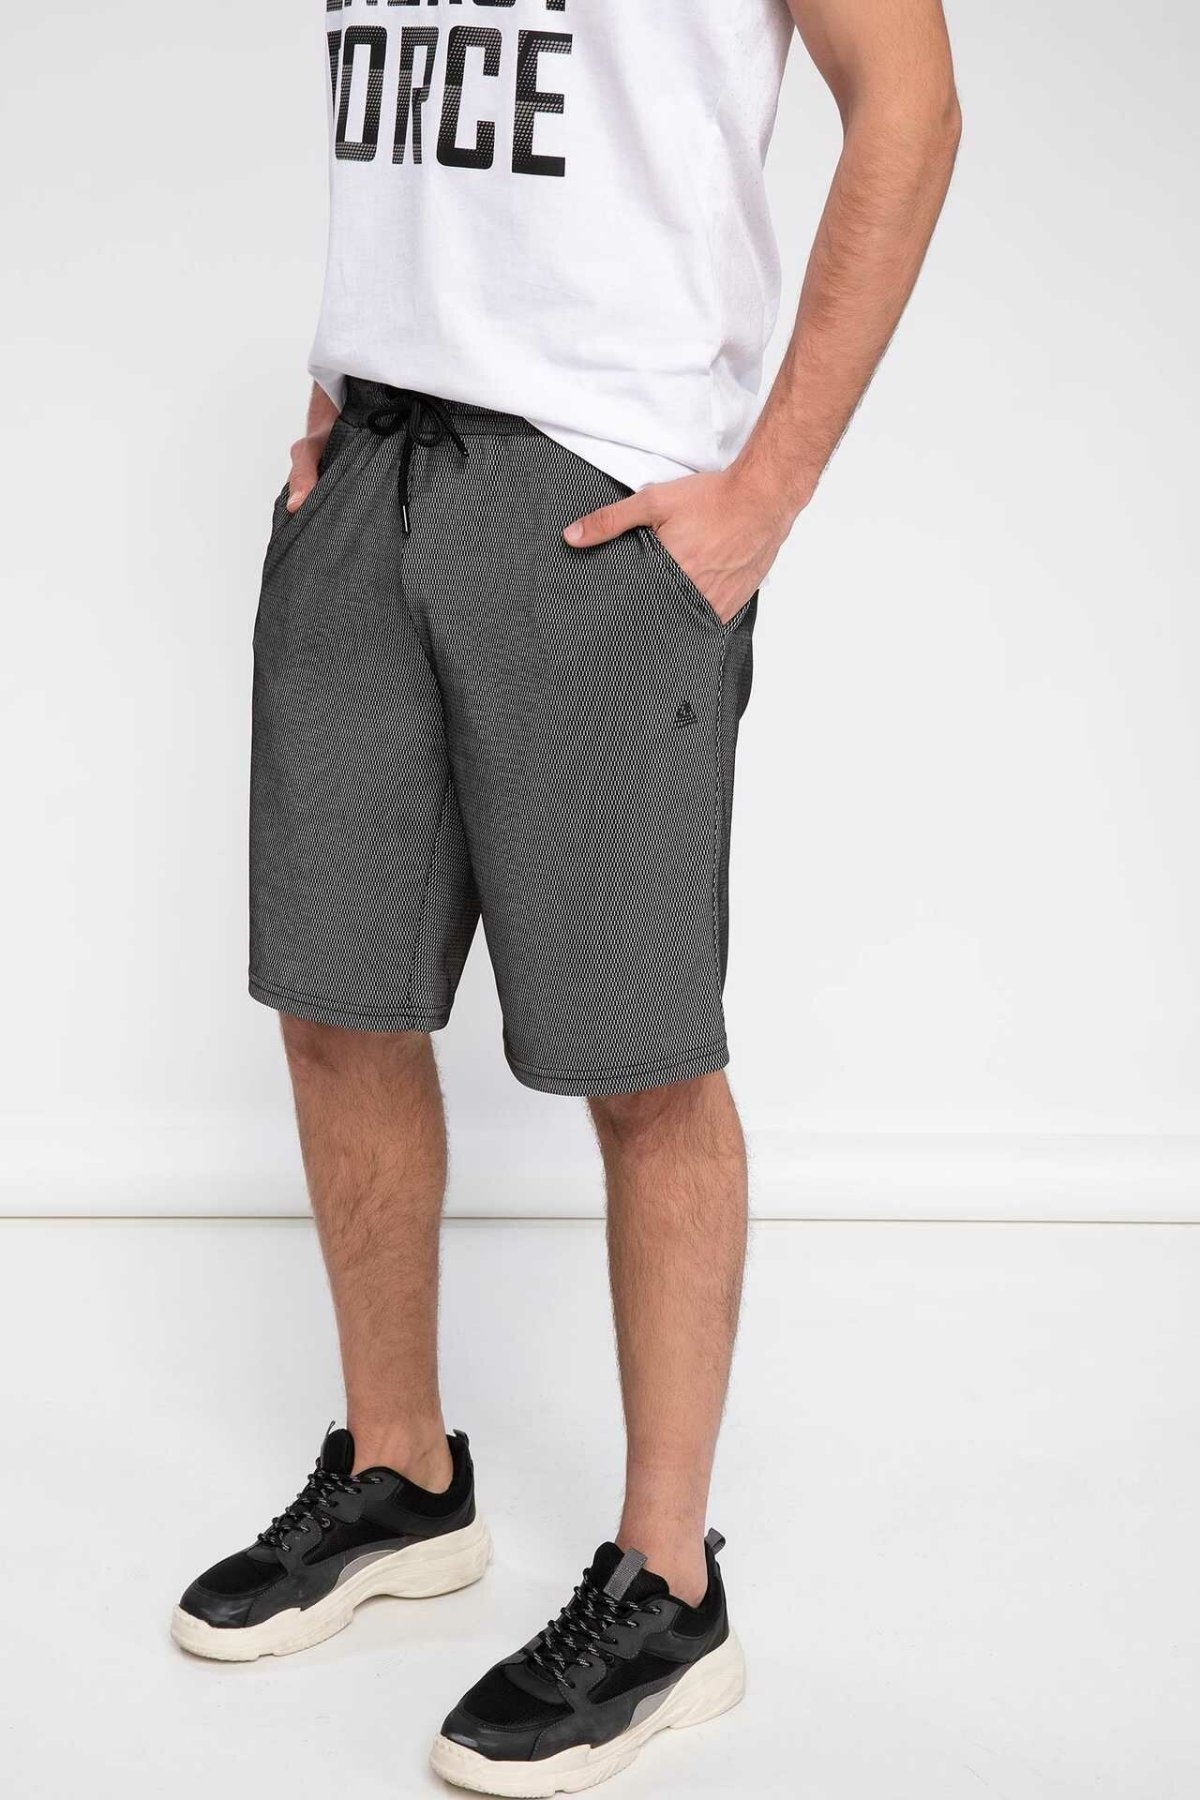 DeFacto Fashion Summer Man Casual Drawstring Waist Pant Male Sport For Men's Striped Sweatpants Bottoms - K1031AZ19SP